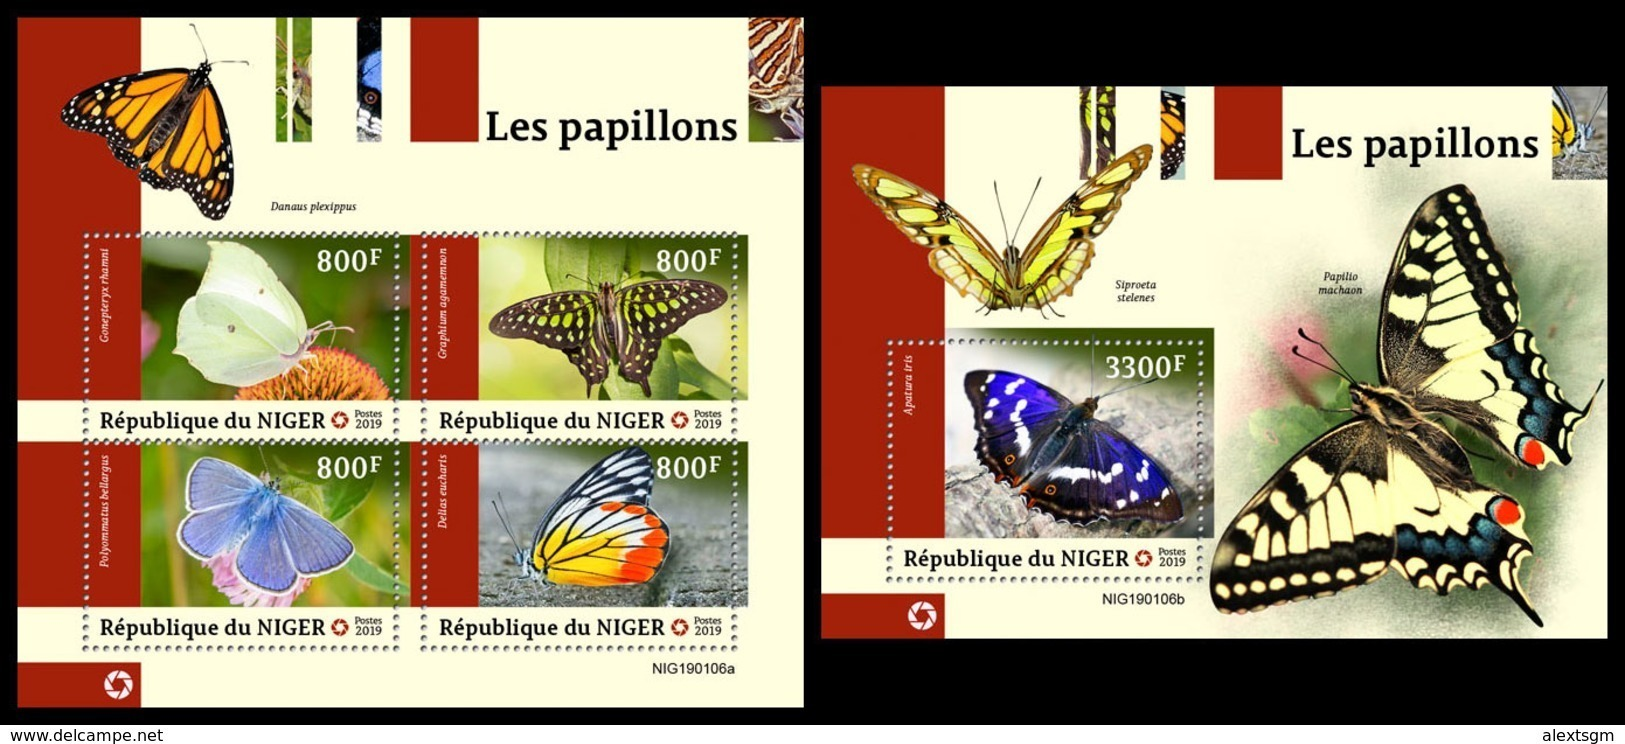 NIGER 2019 - Butterflies, M/S + S/S. Official Issue [NIG190106] - Vlinders